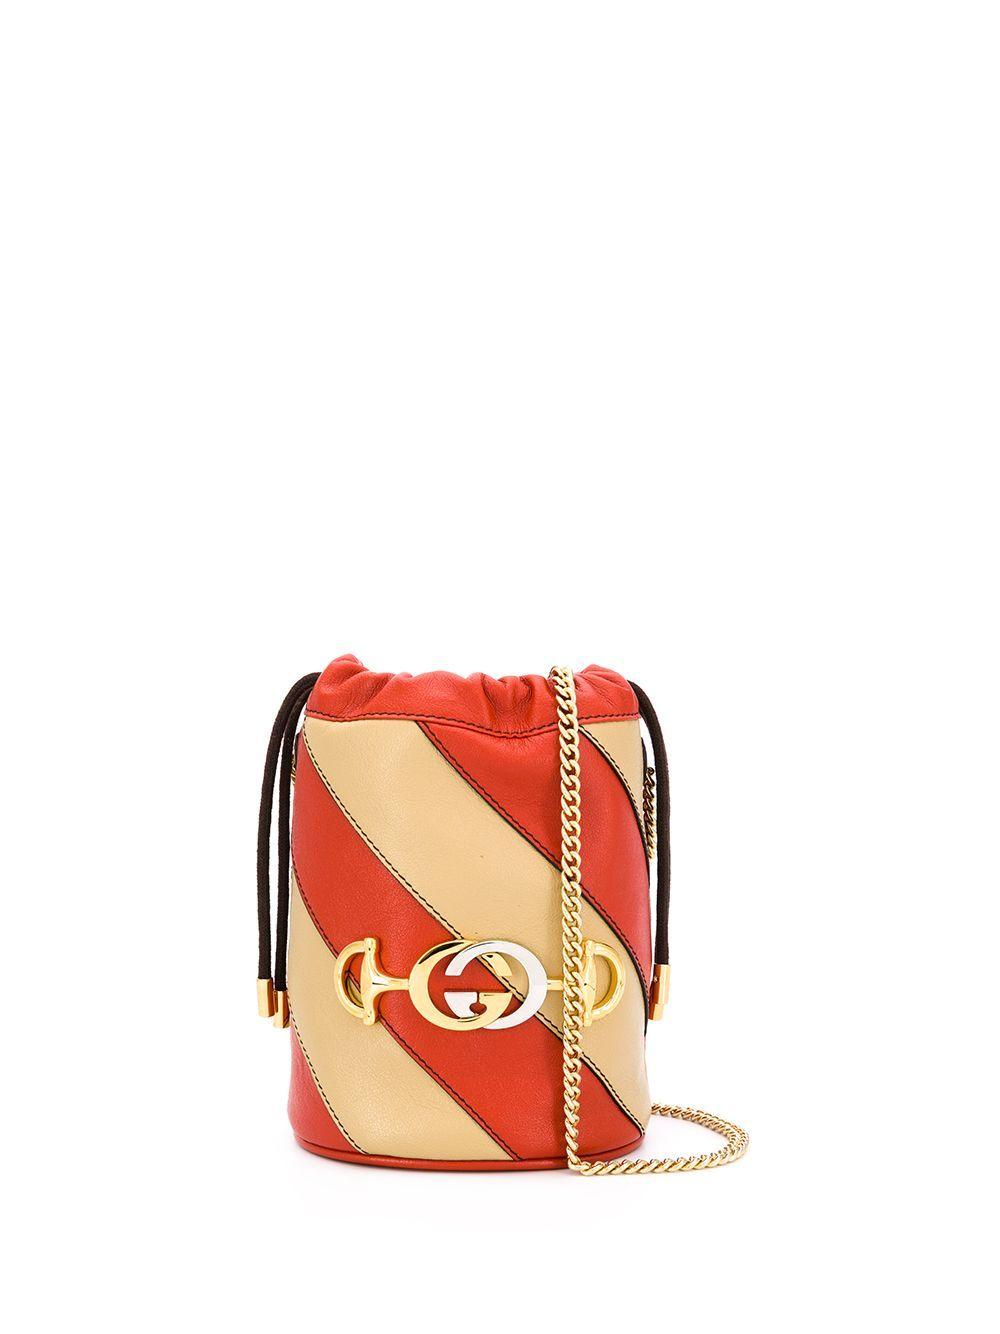 Gucci Mini Zumi Bucket Bag Farfetch In 2020 Bucket Bag Bags Gucci